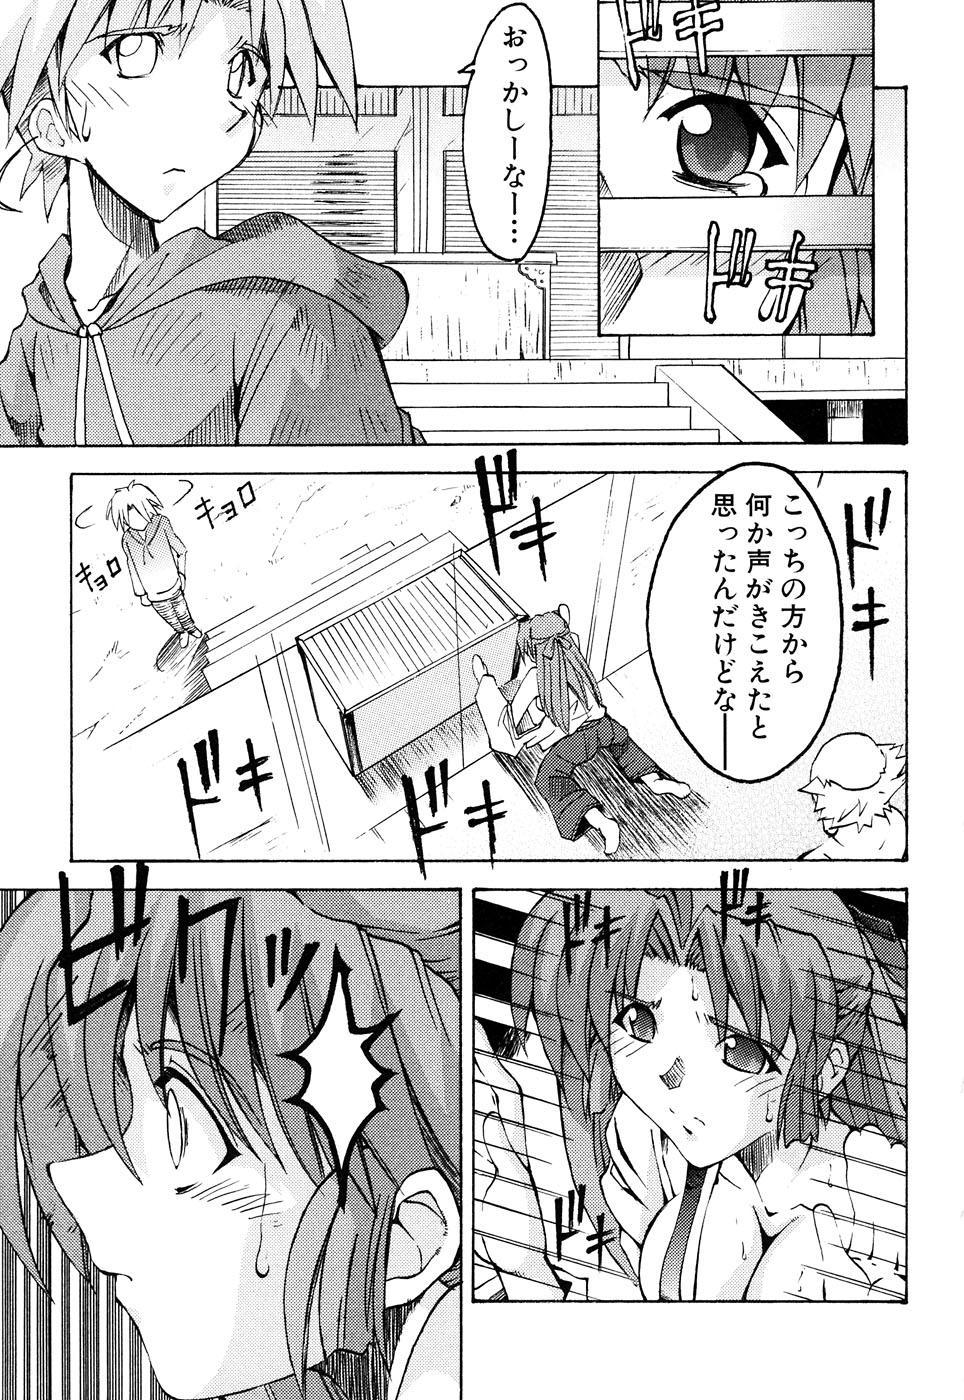 Fechikko VS Series ROUND.2 Miko San VS Maid San 31